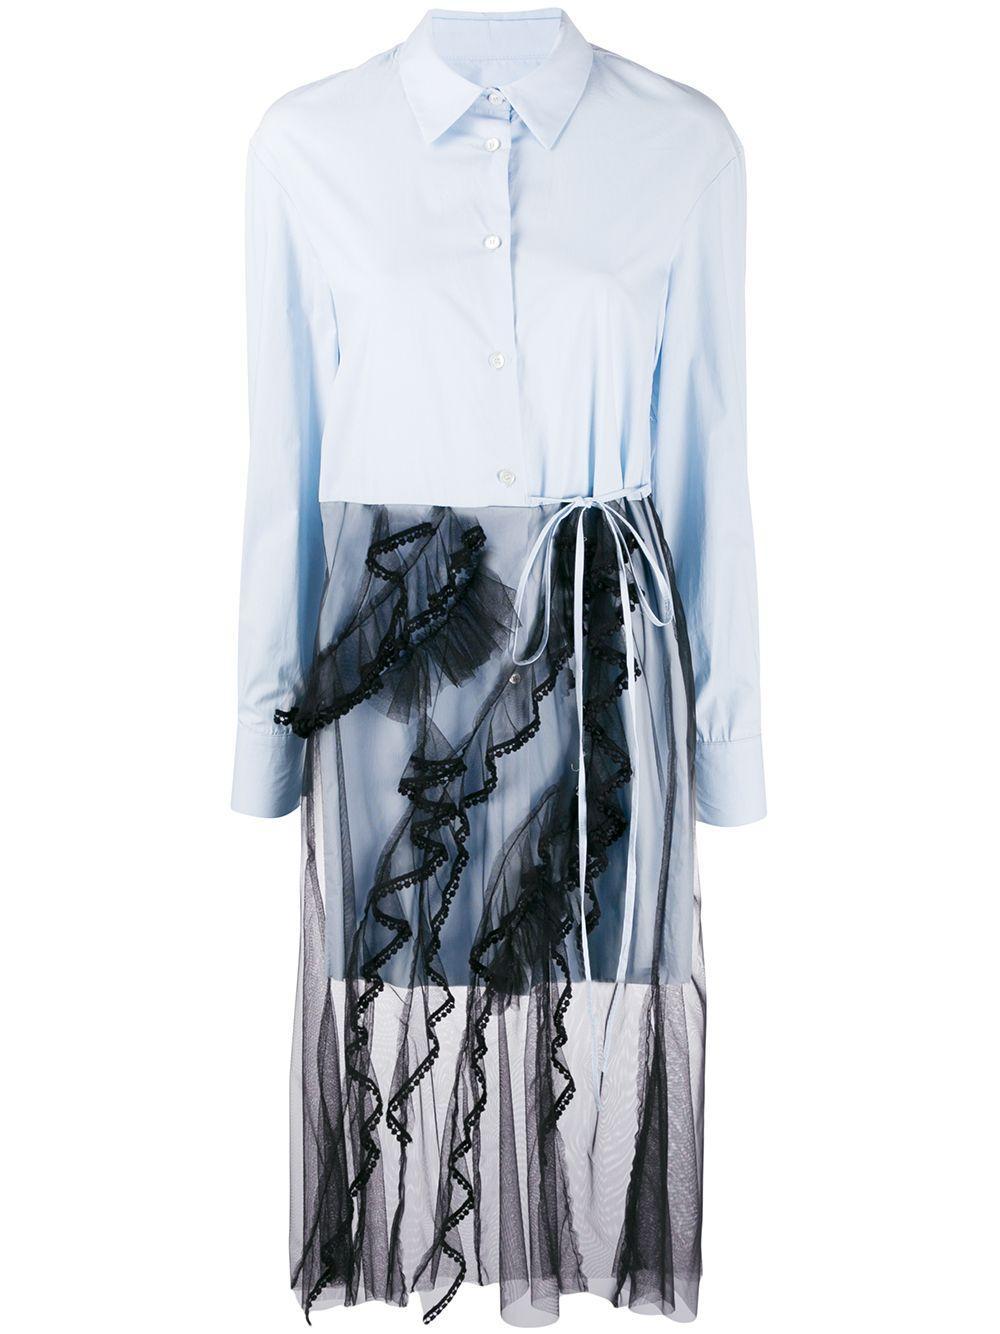 Long Sleeve Poplin Top With Tulle Skirt Item # FWT1906